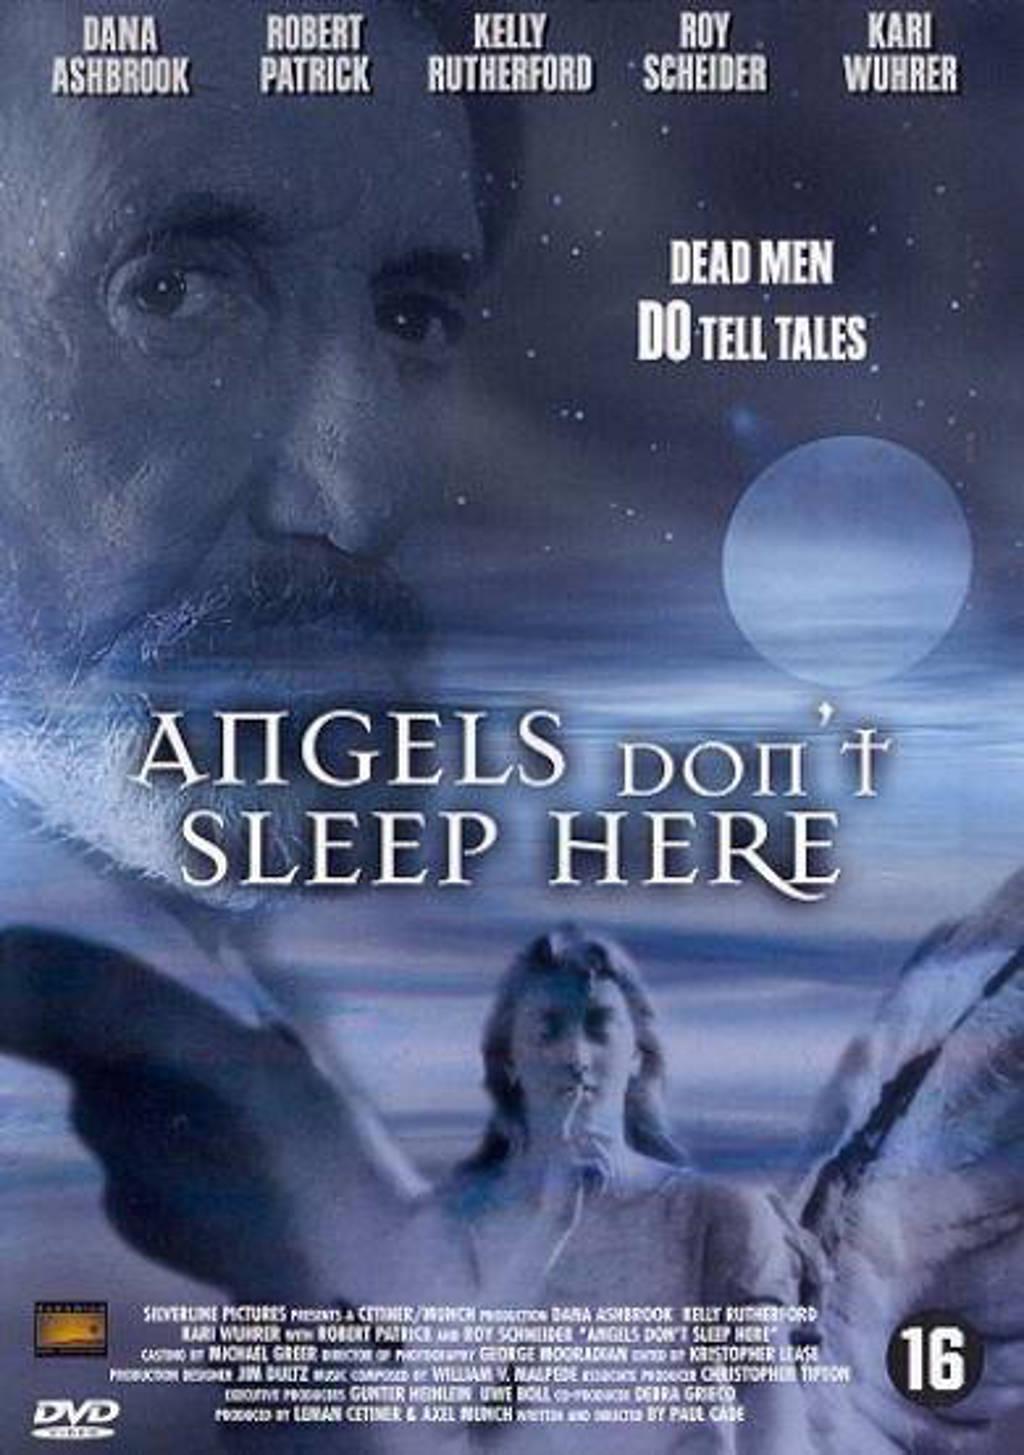 Angels don't sleep here (DVD)